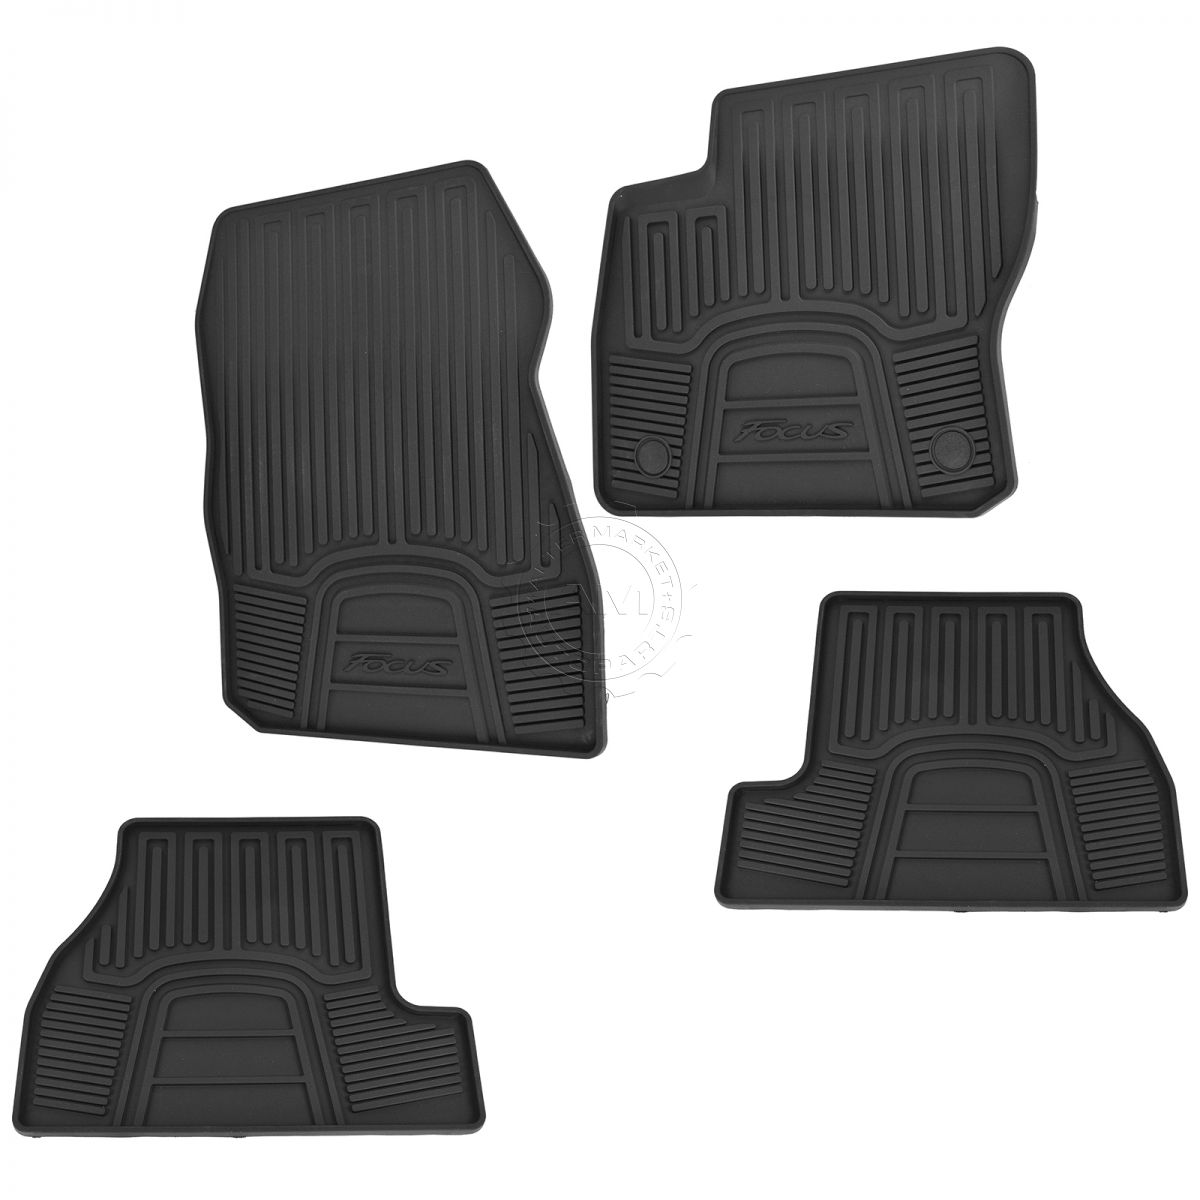 OEM Floor Mat Black Rubber LH RH Front & Rear Kit Set of 4 for 12